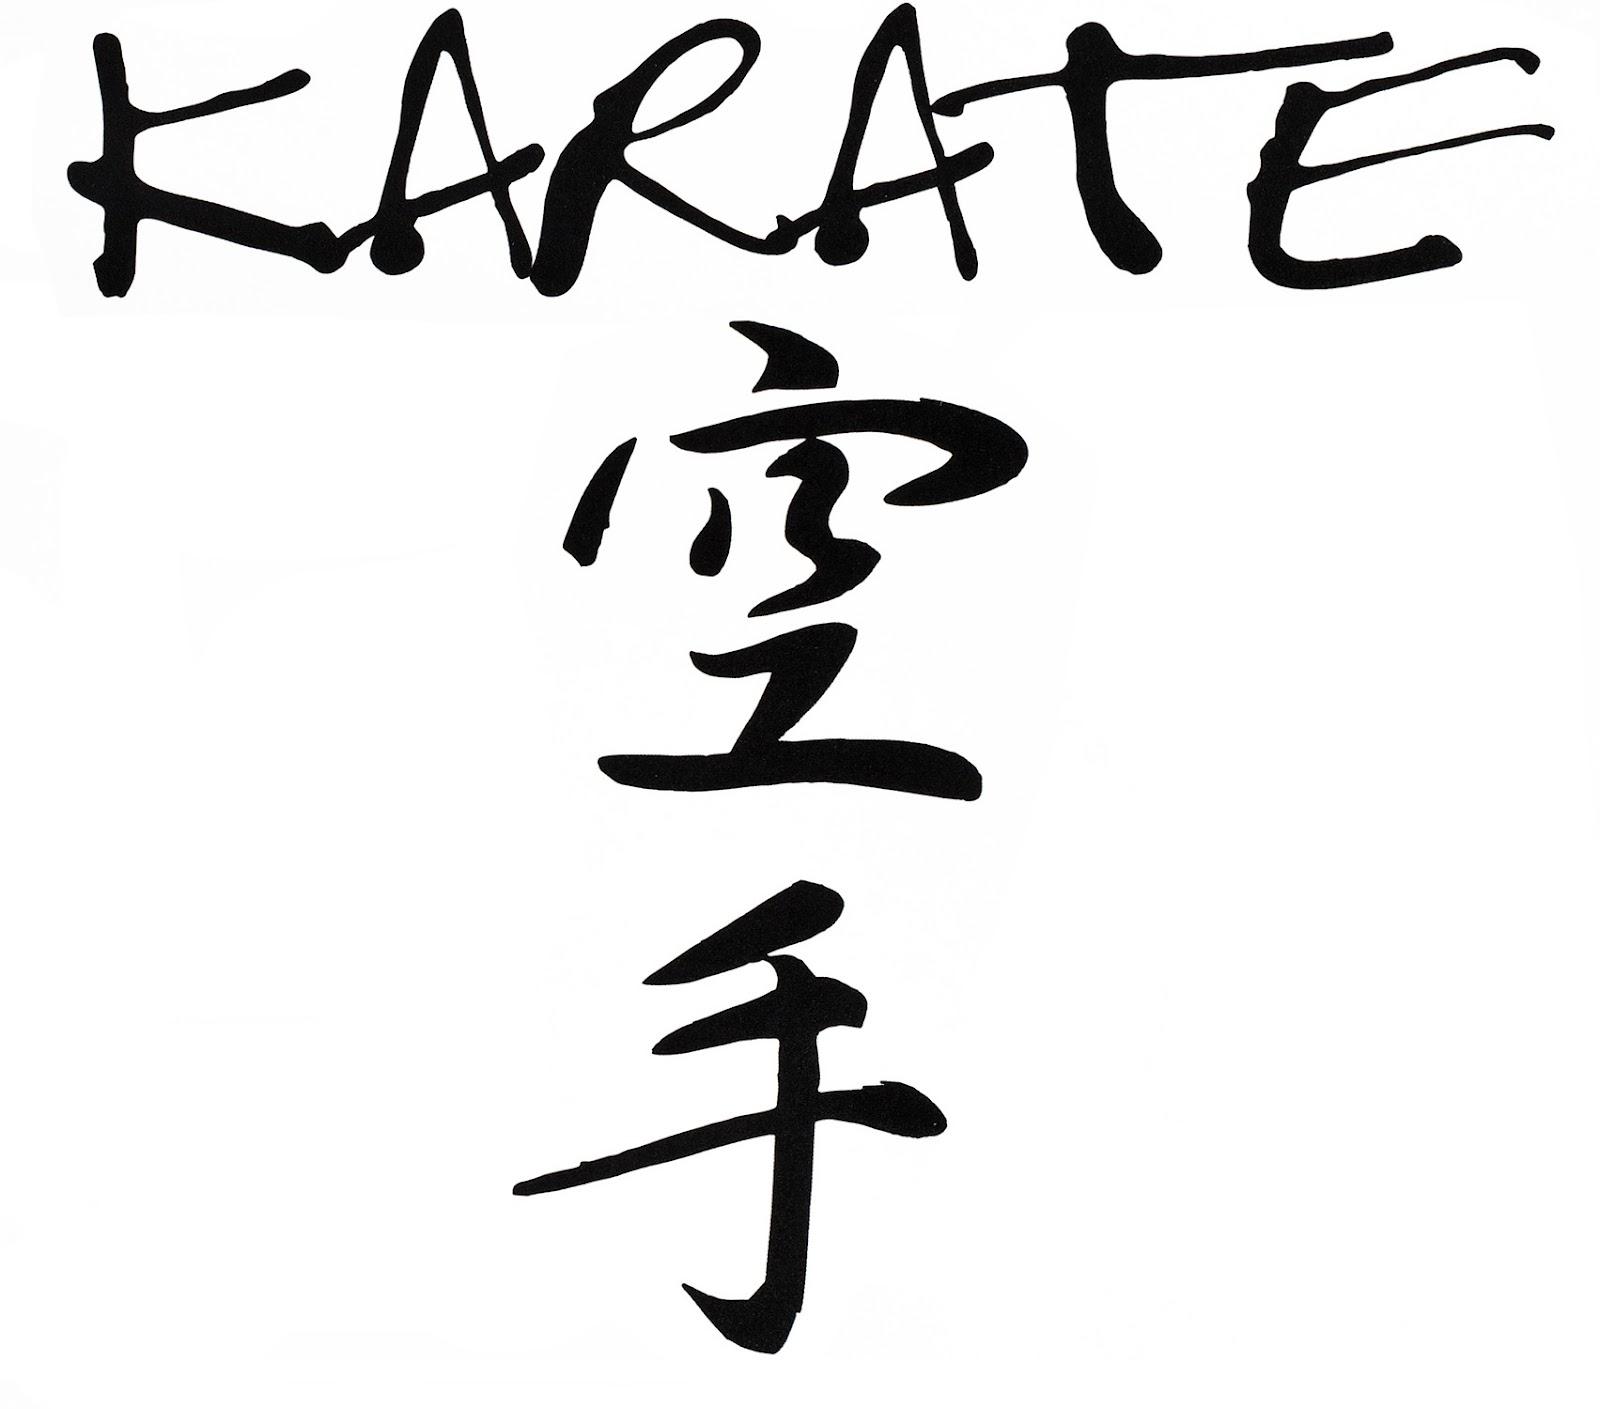 Free Karate Download Free Clip Art Free Clip Art On